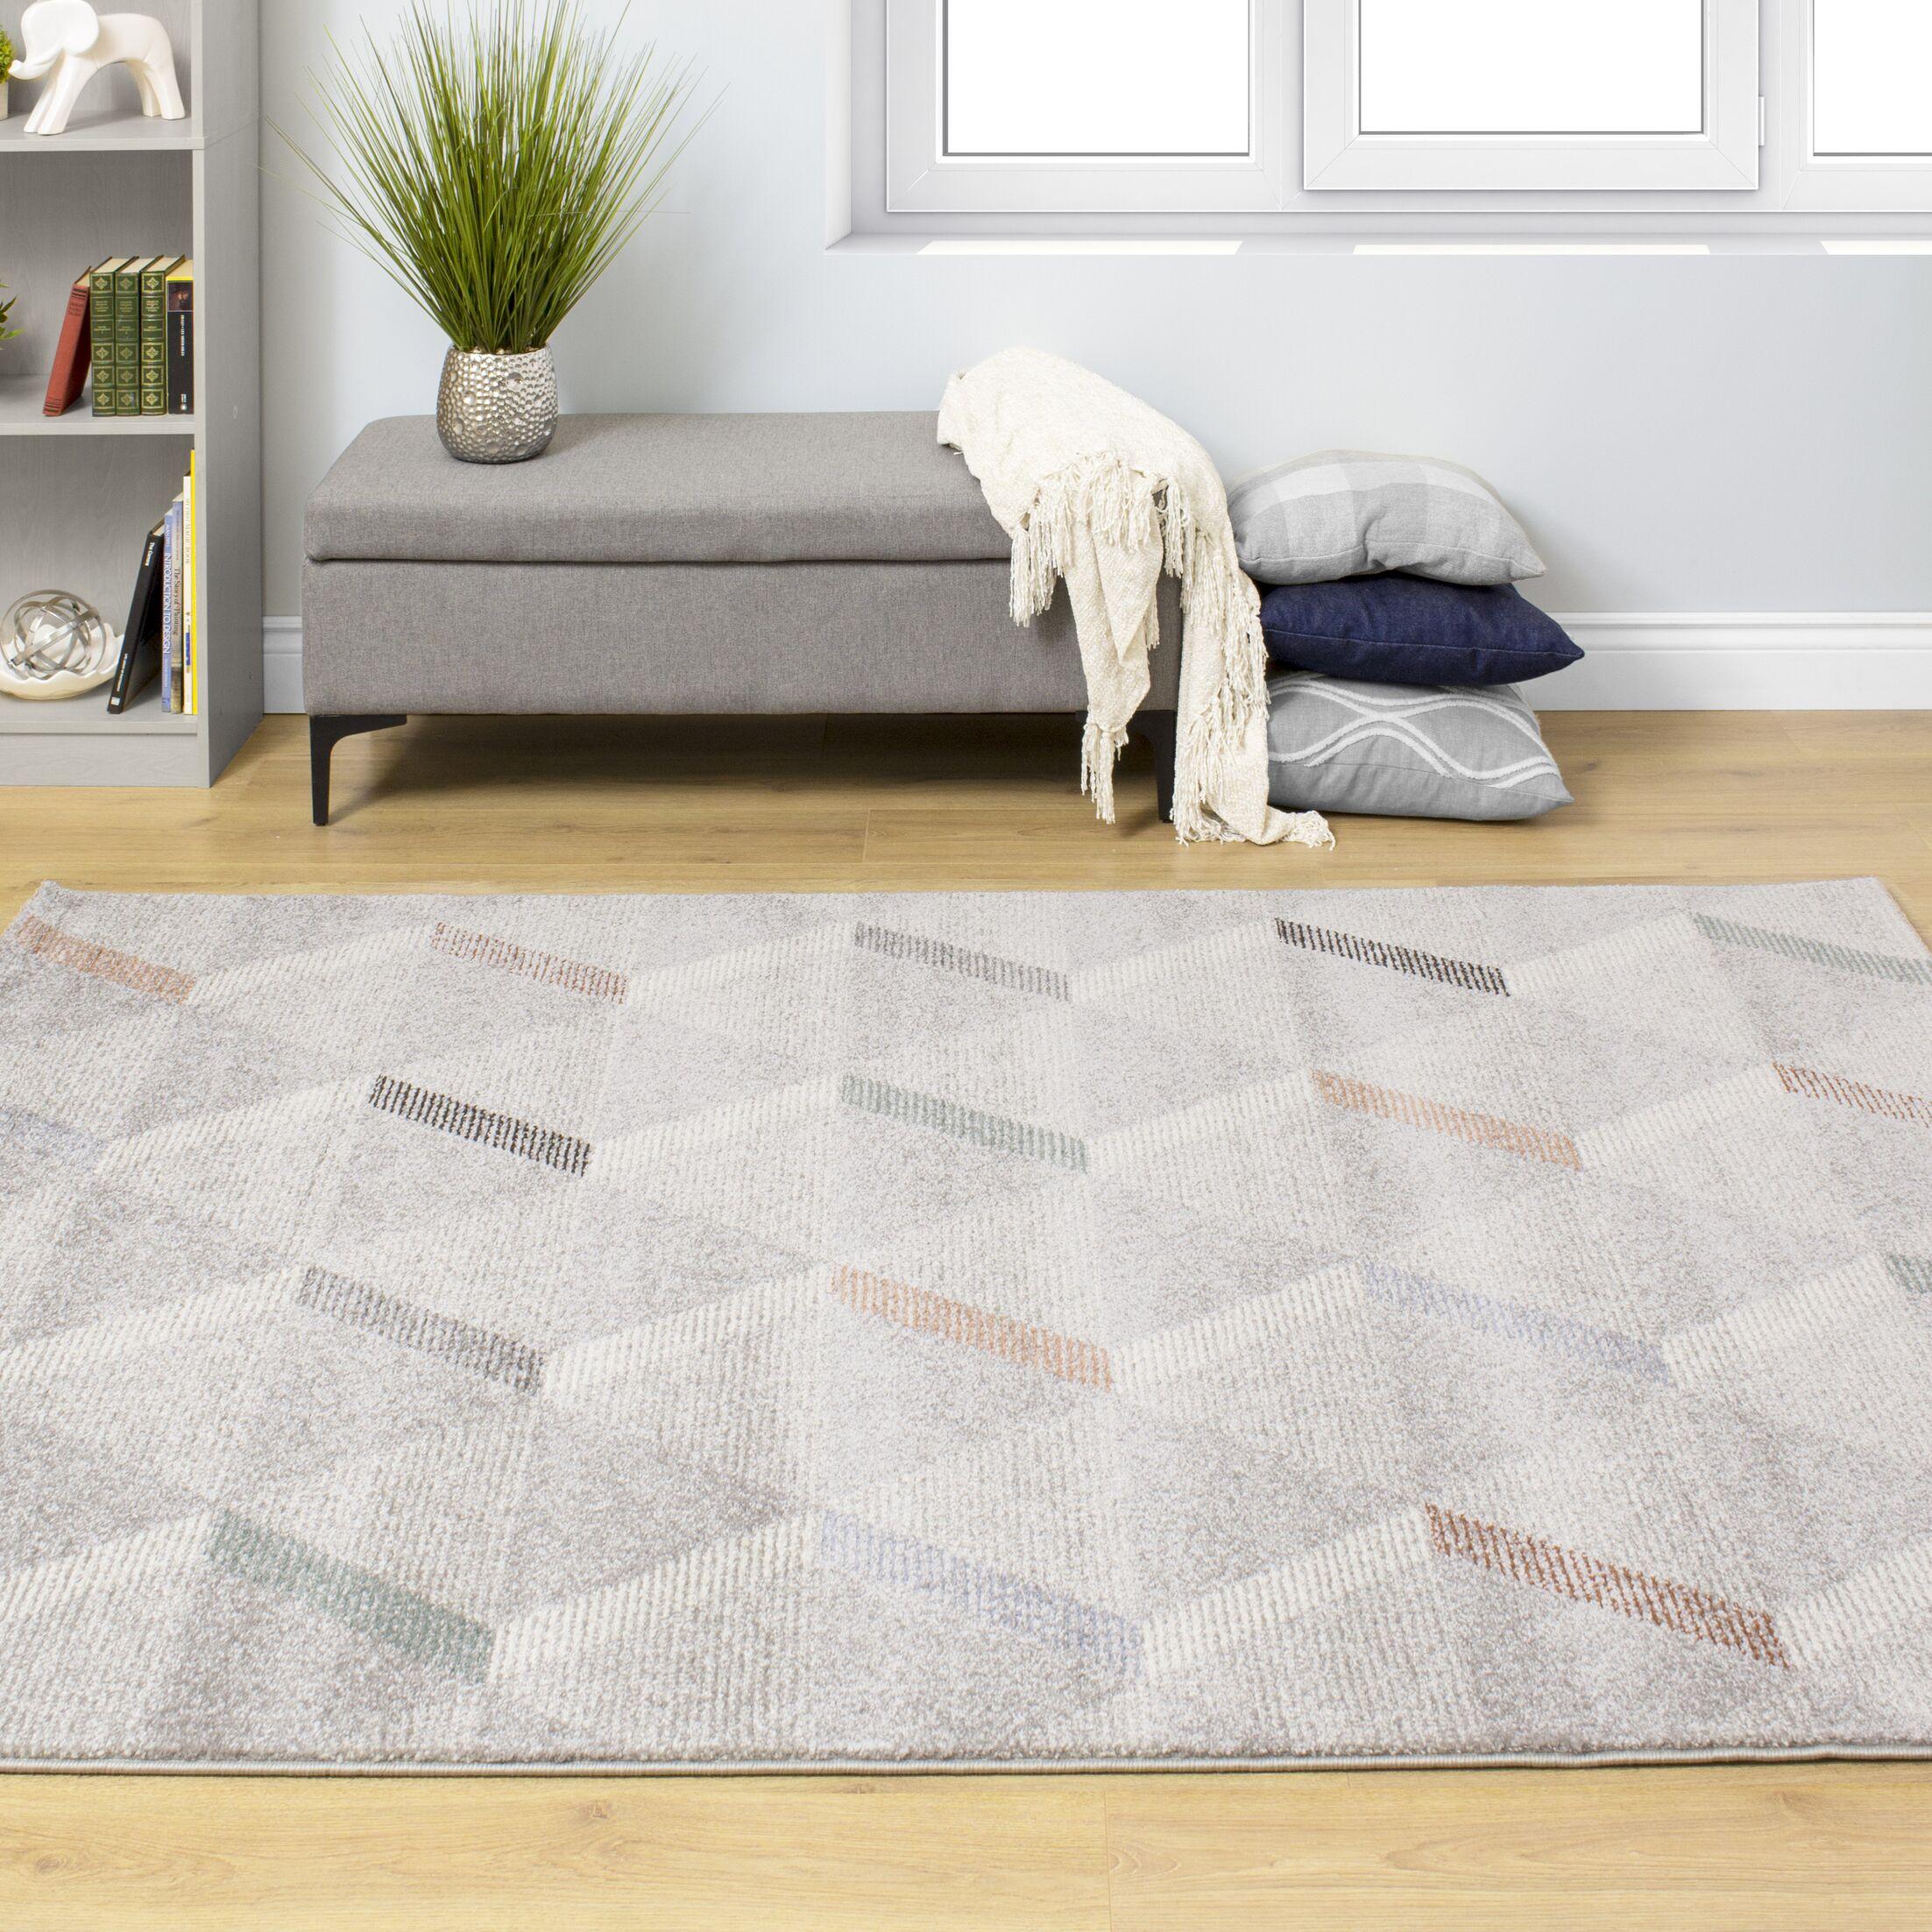 Greve Subtle Triangles Gray/Orange Area Rug Rug Size: Rectangle 7'10'' x 10'10''